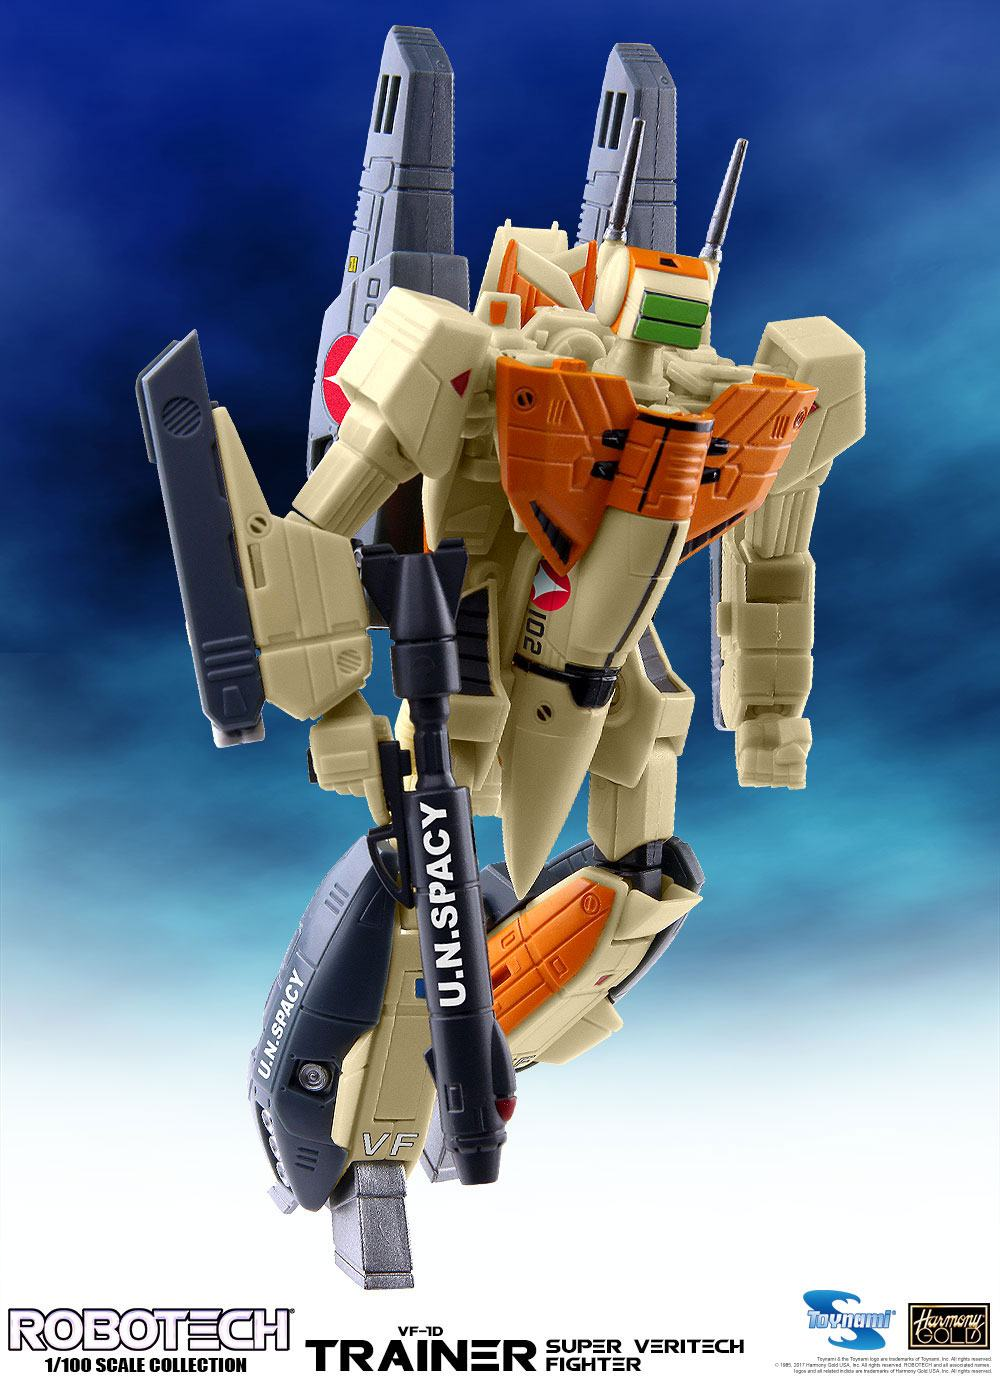 Robotech Super Veritech Fighter Collection Action Figure 1/100 VF-1D Super Veritech Trainer 15 cm